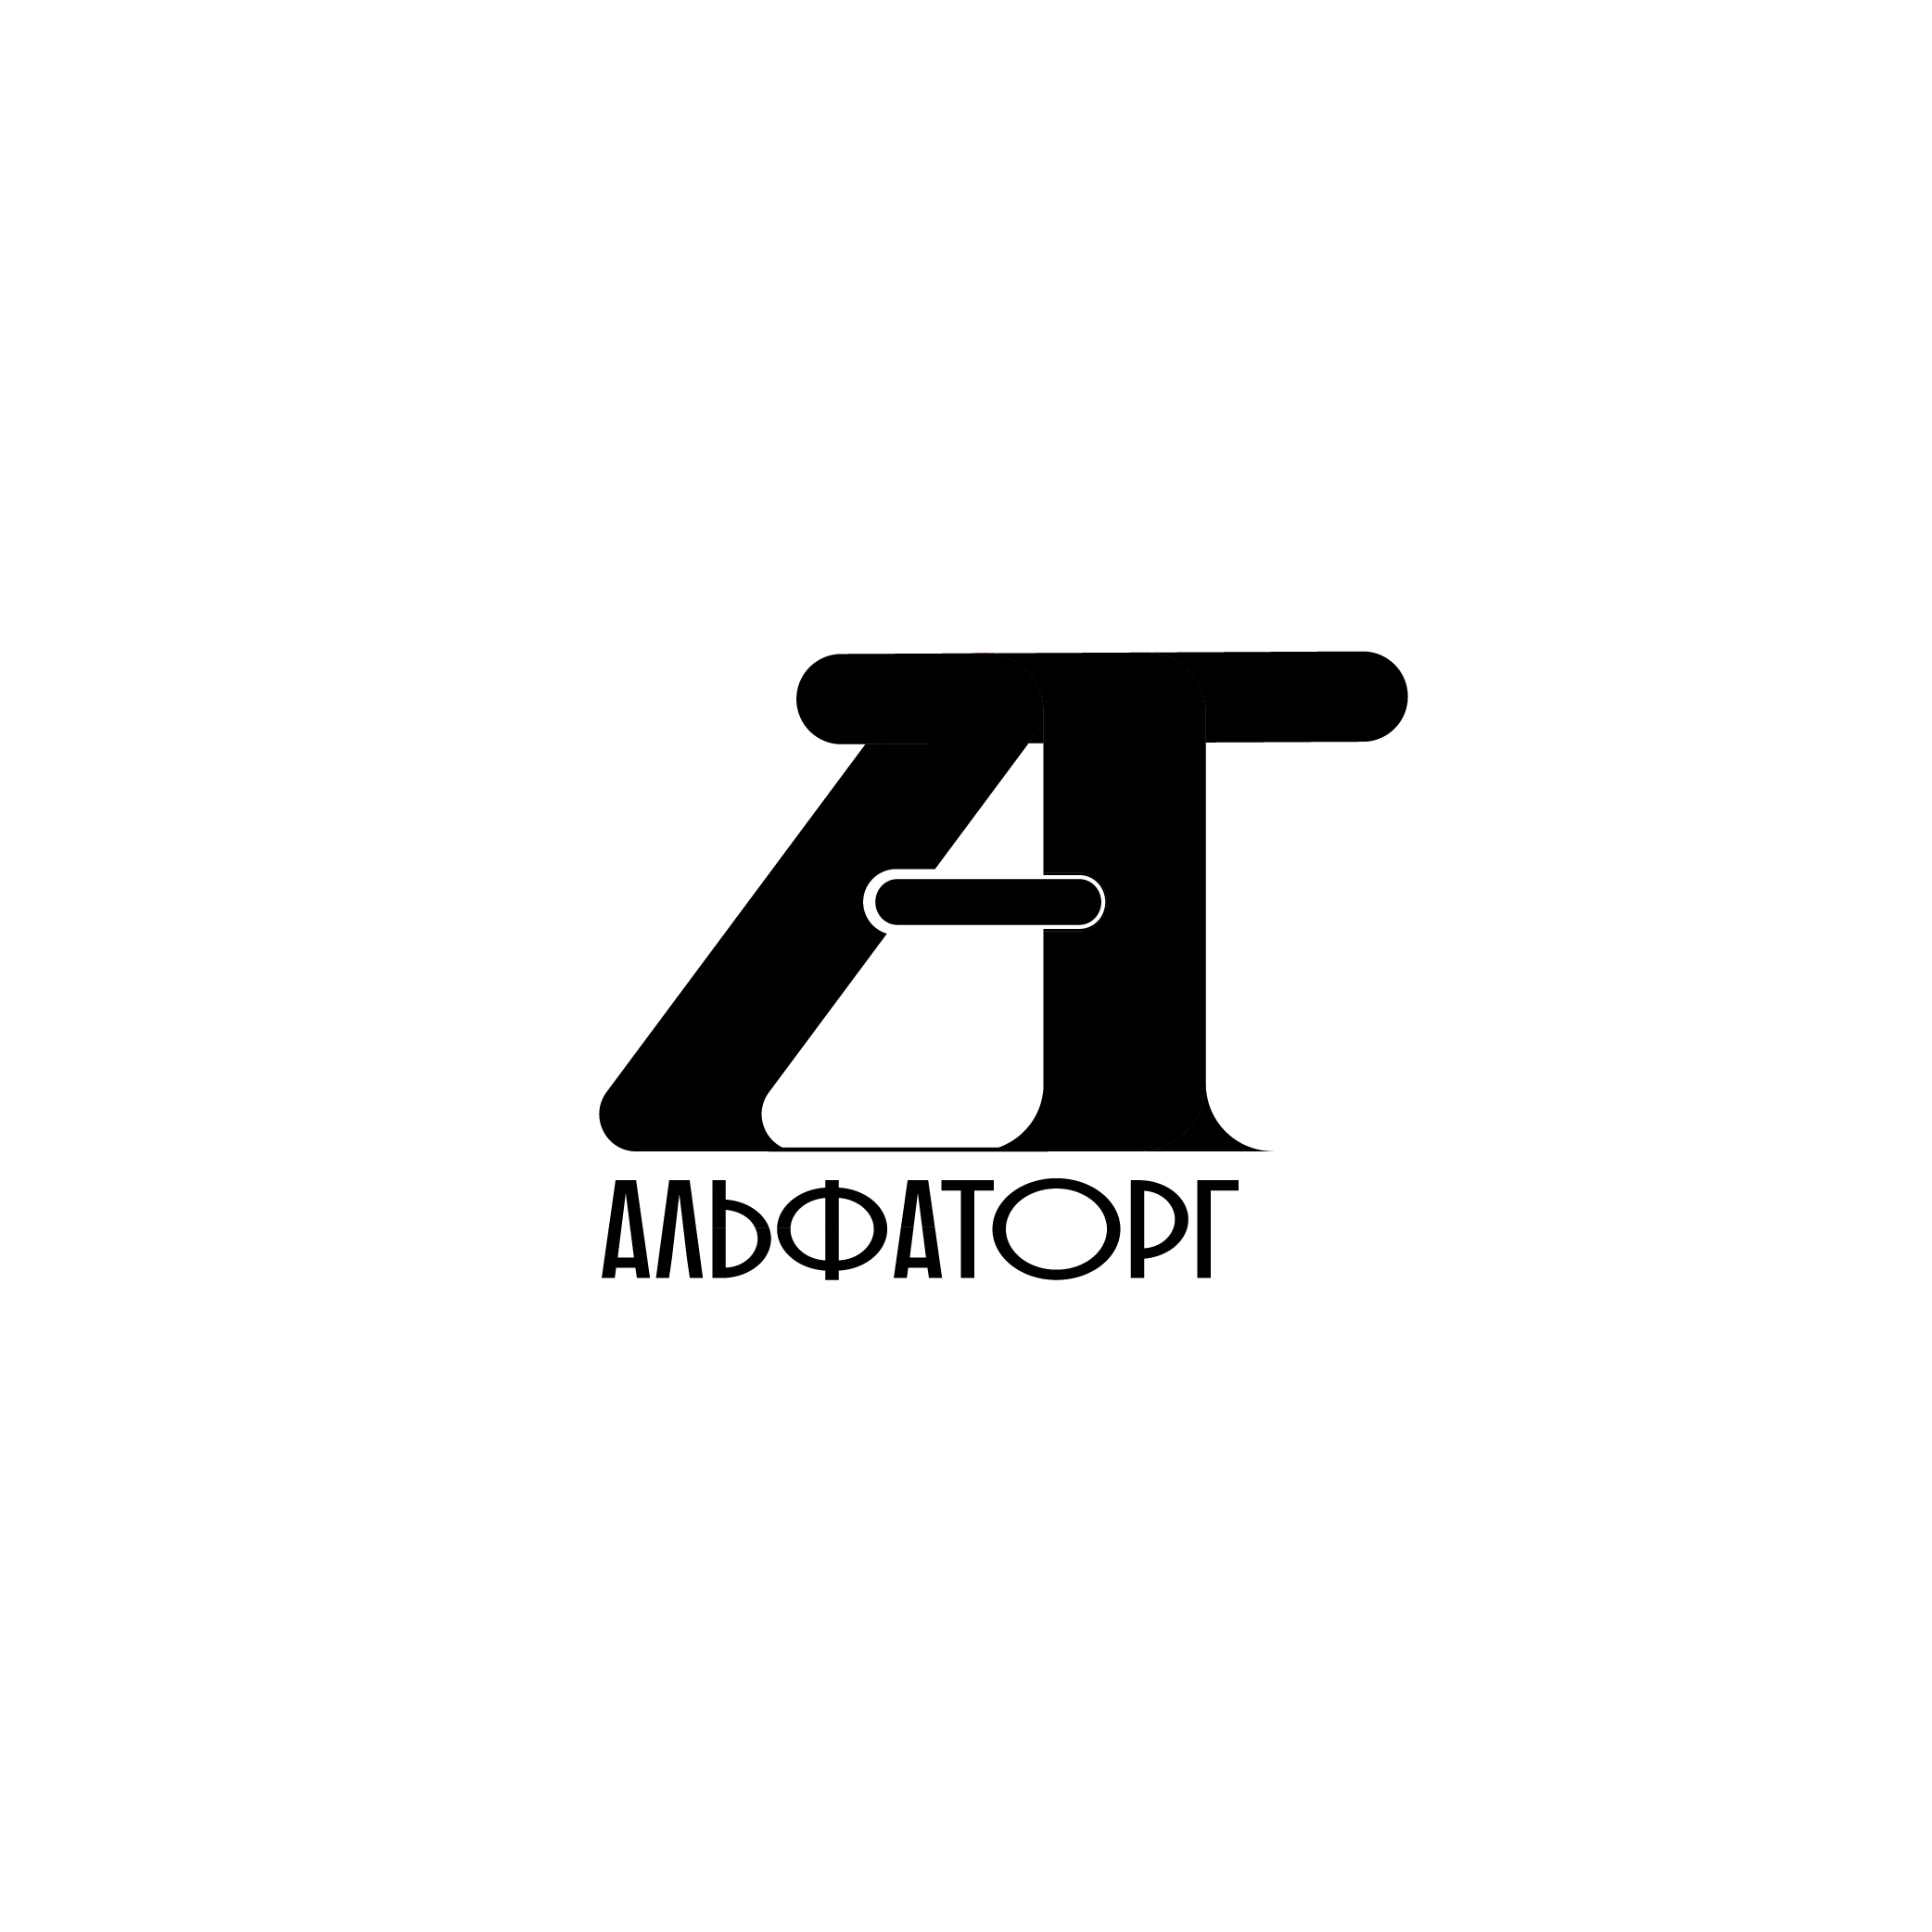 Логотип и фирменный стиль фото f_5485ef8a9155589b.jpg